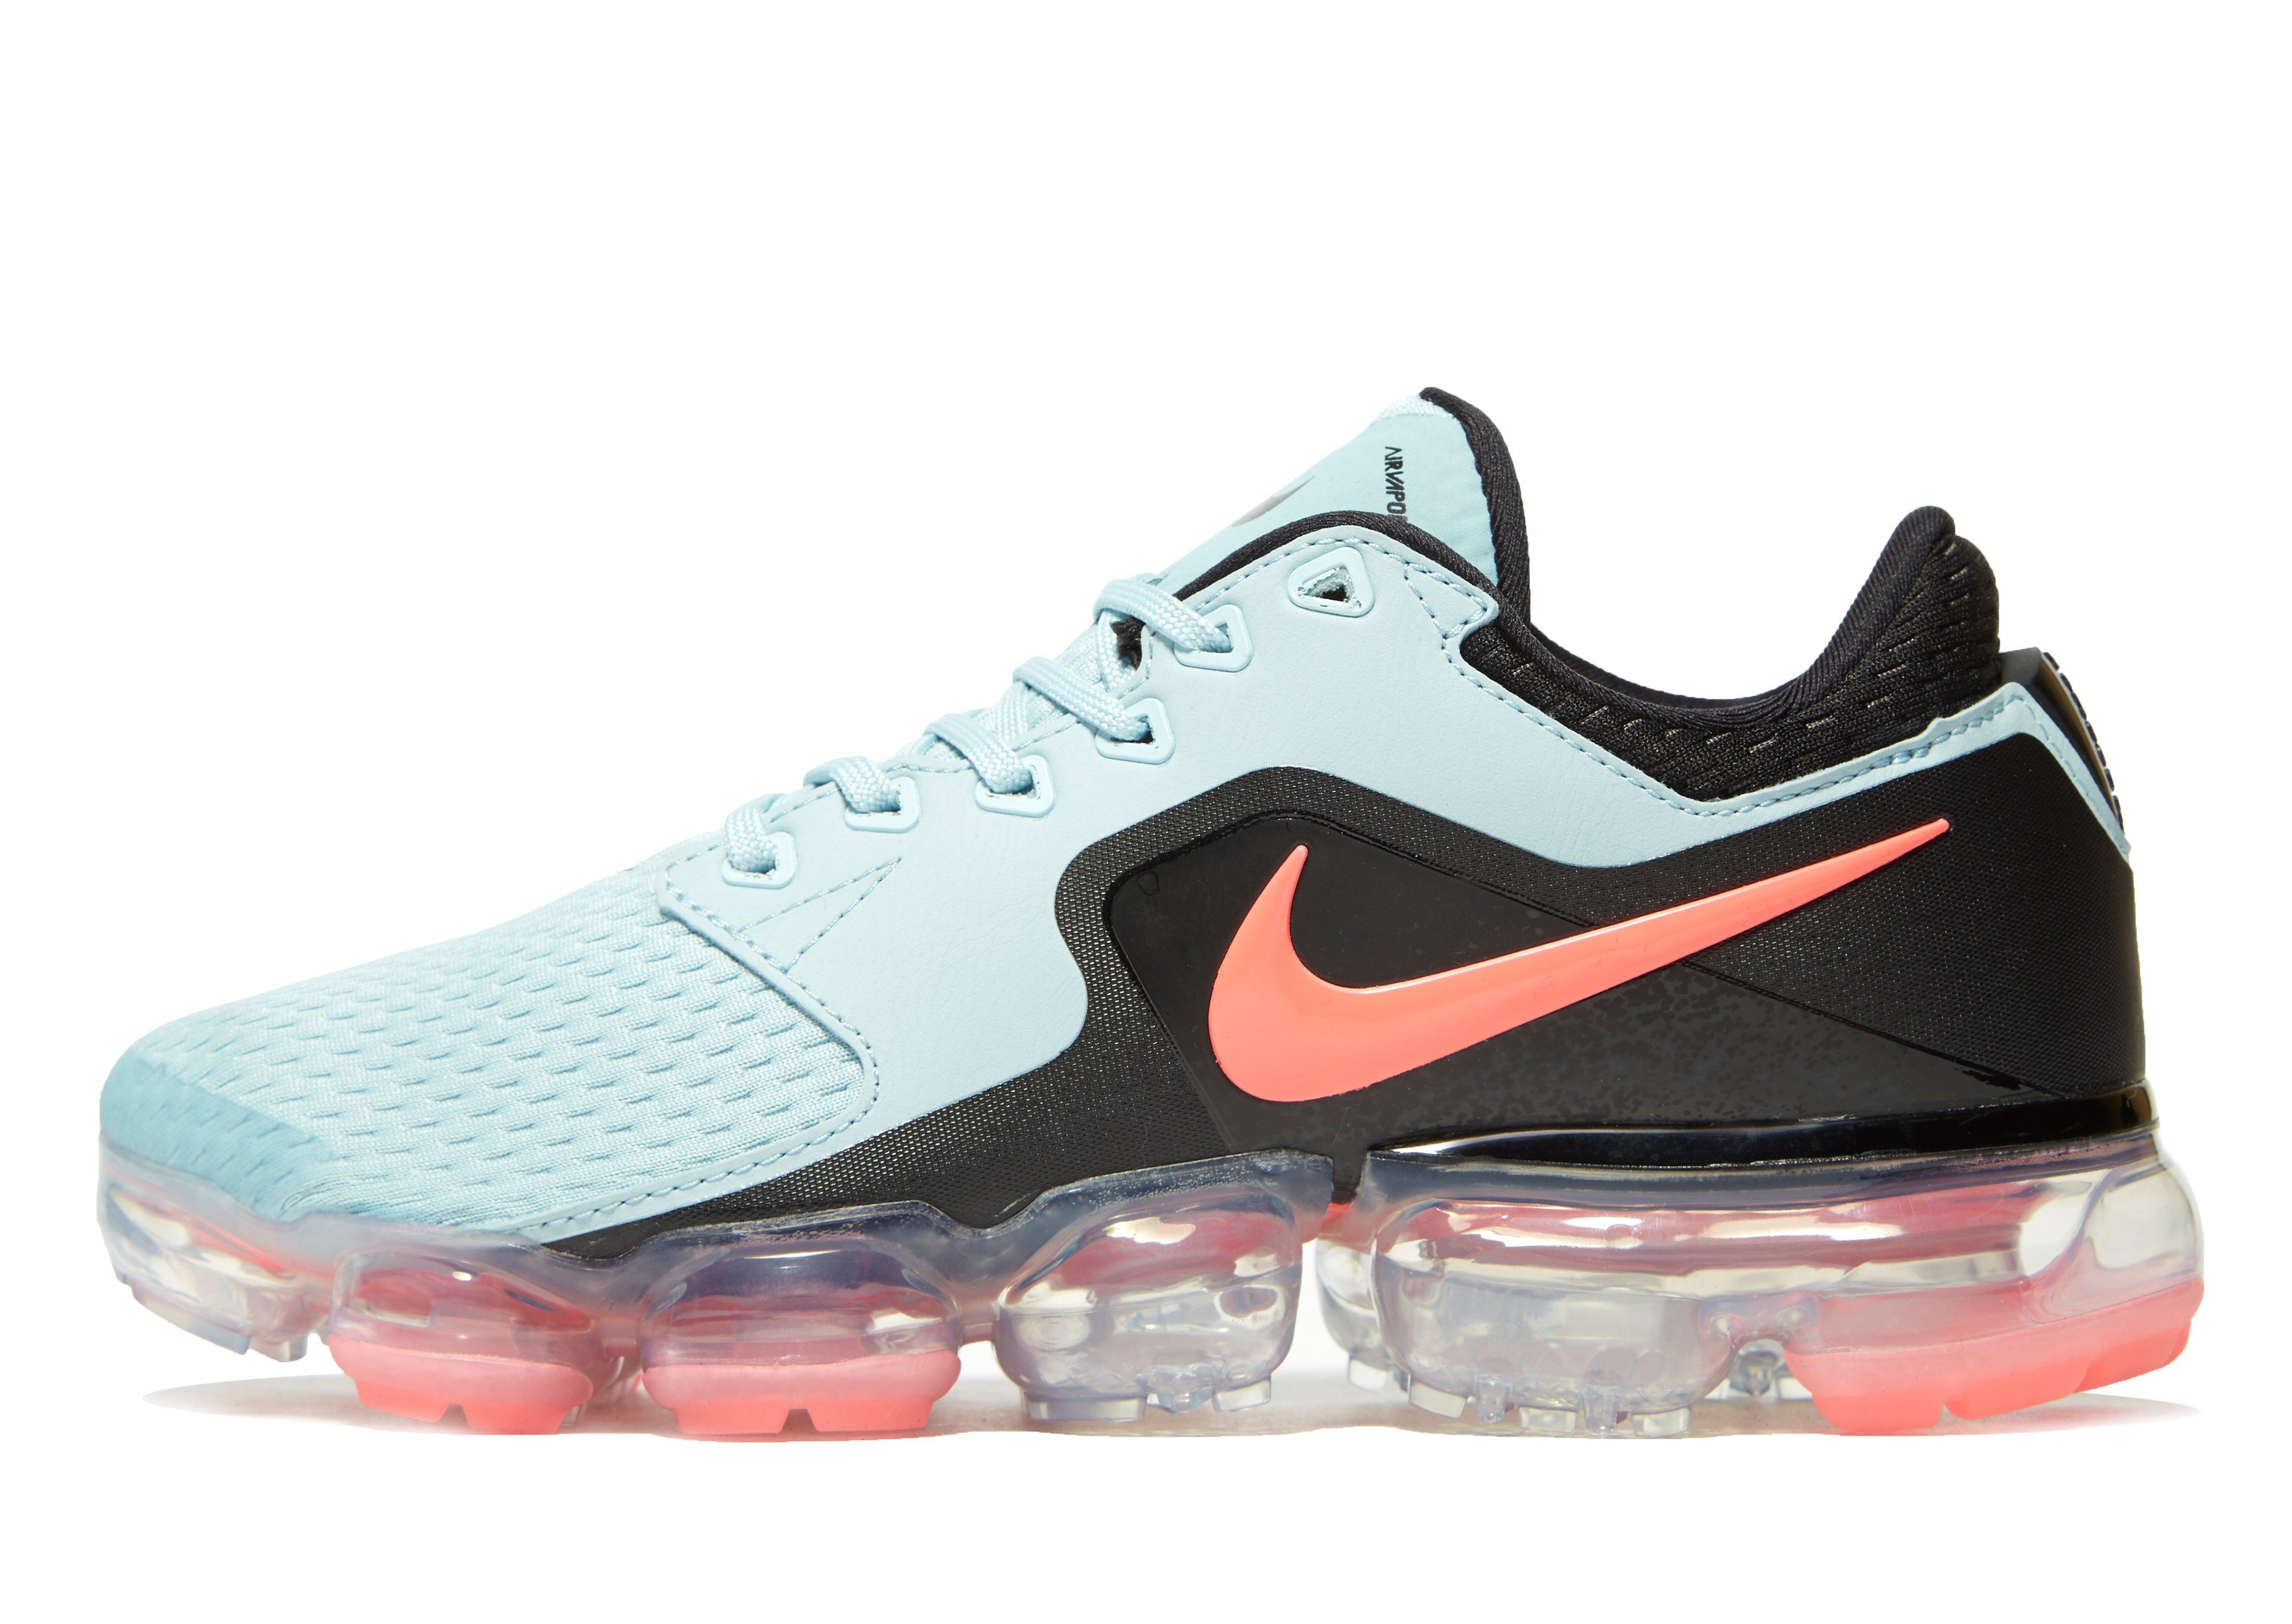 839e93428b1 Lyst - Nike Air Vapormax for Men